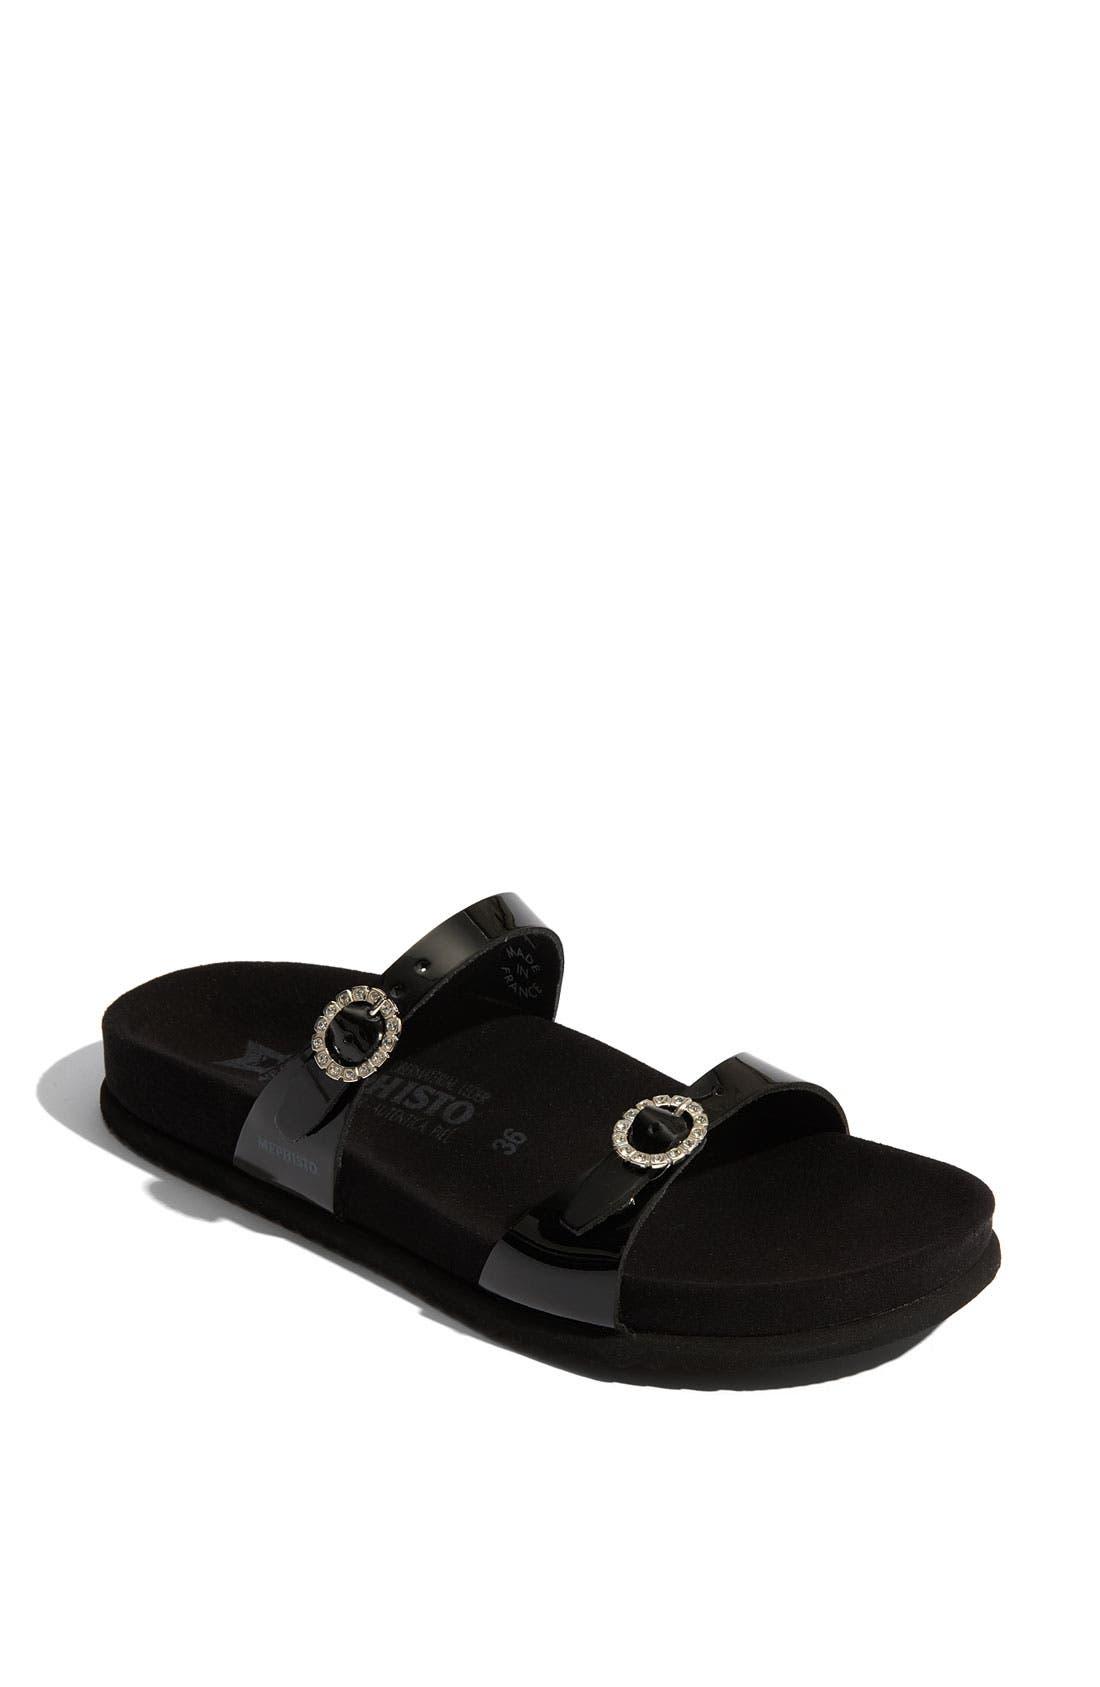 Alternate Image 1 Selected - Mephisto 'Sydel' Sandal